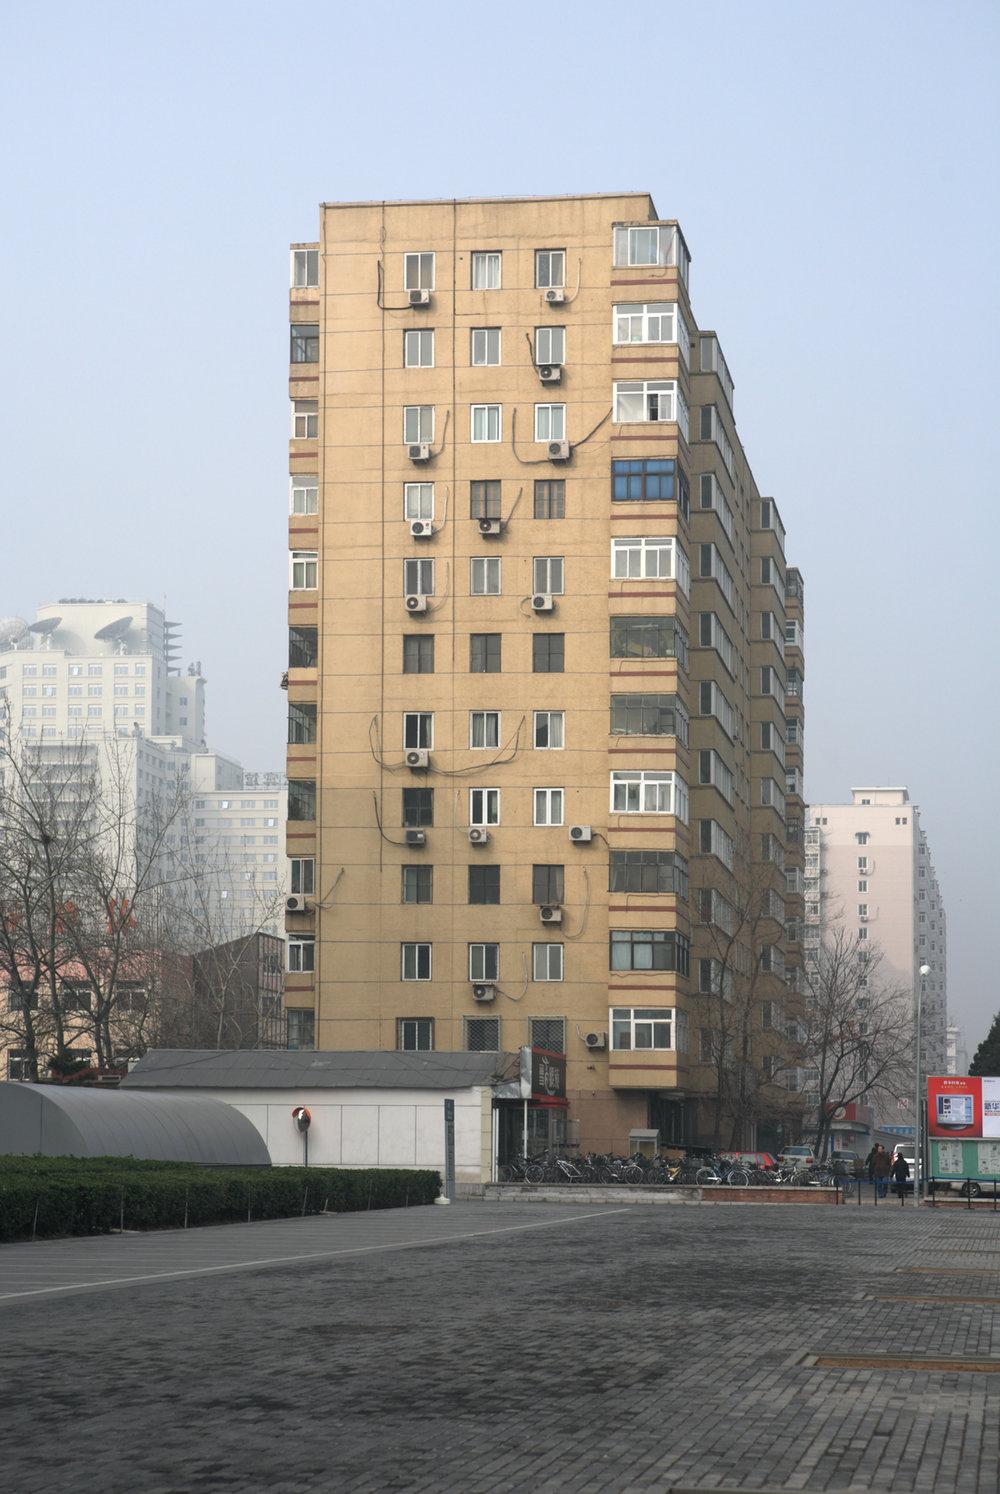 janot-building1-2007.jpg